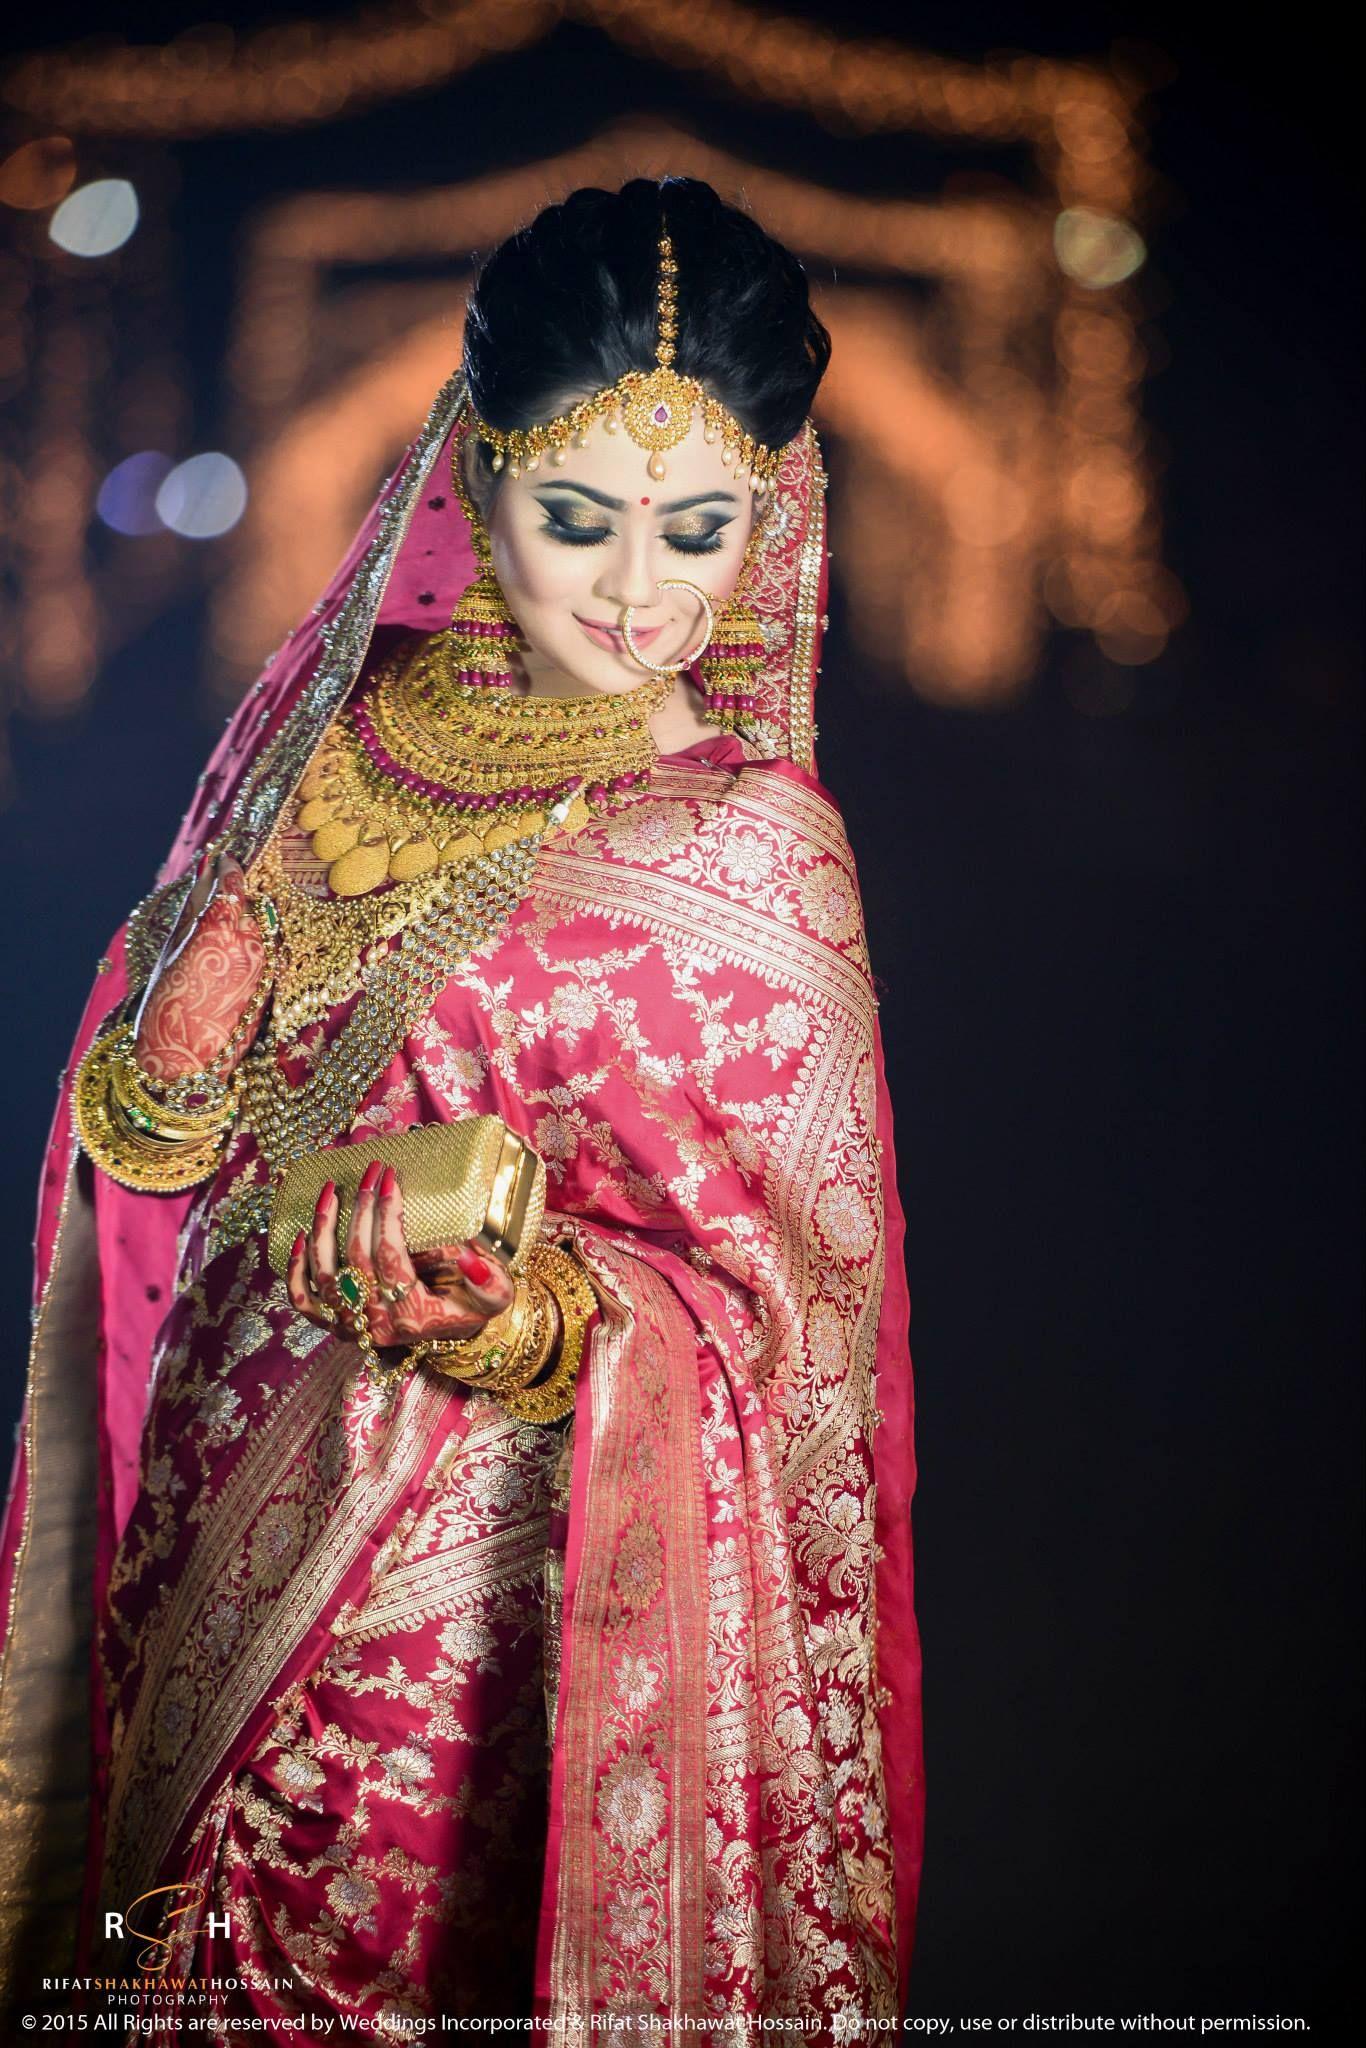 Encantador Bengali Wedding Dress Viñeta - Colección de Vestidos de ...